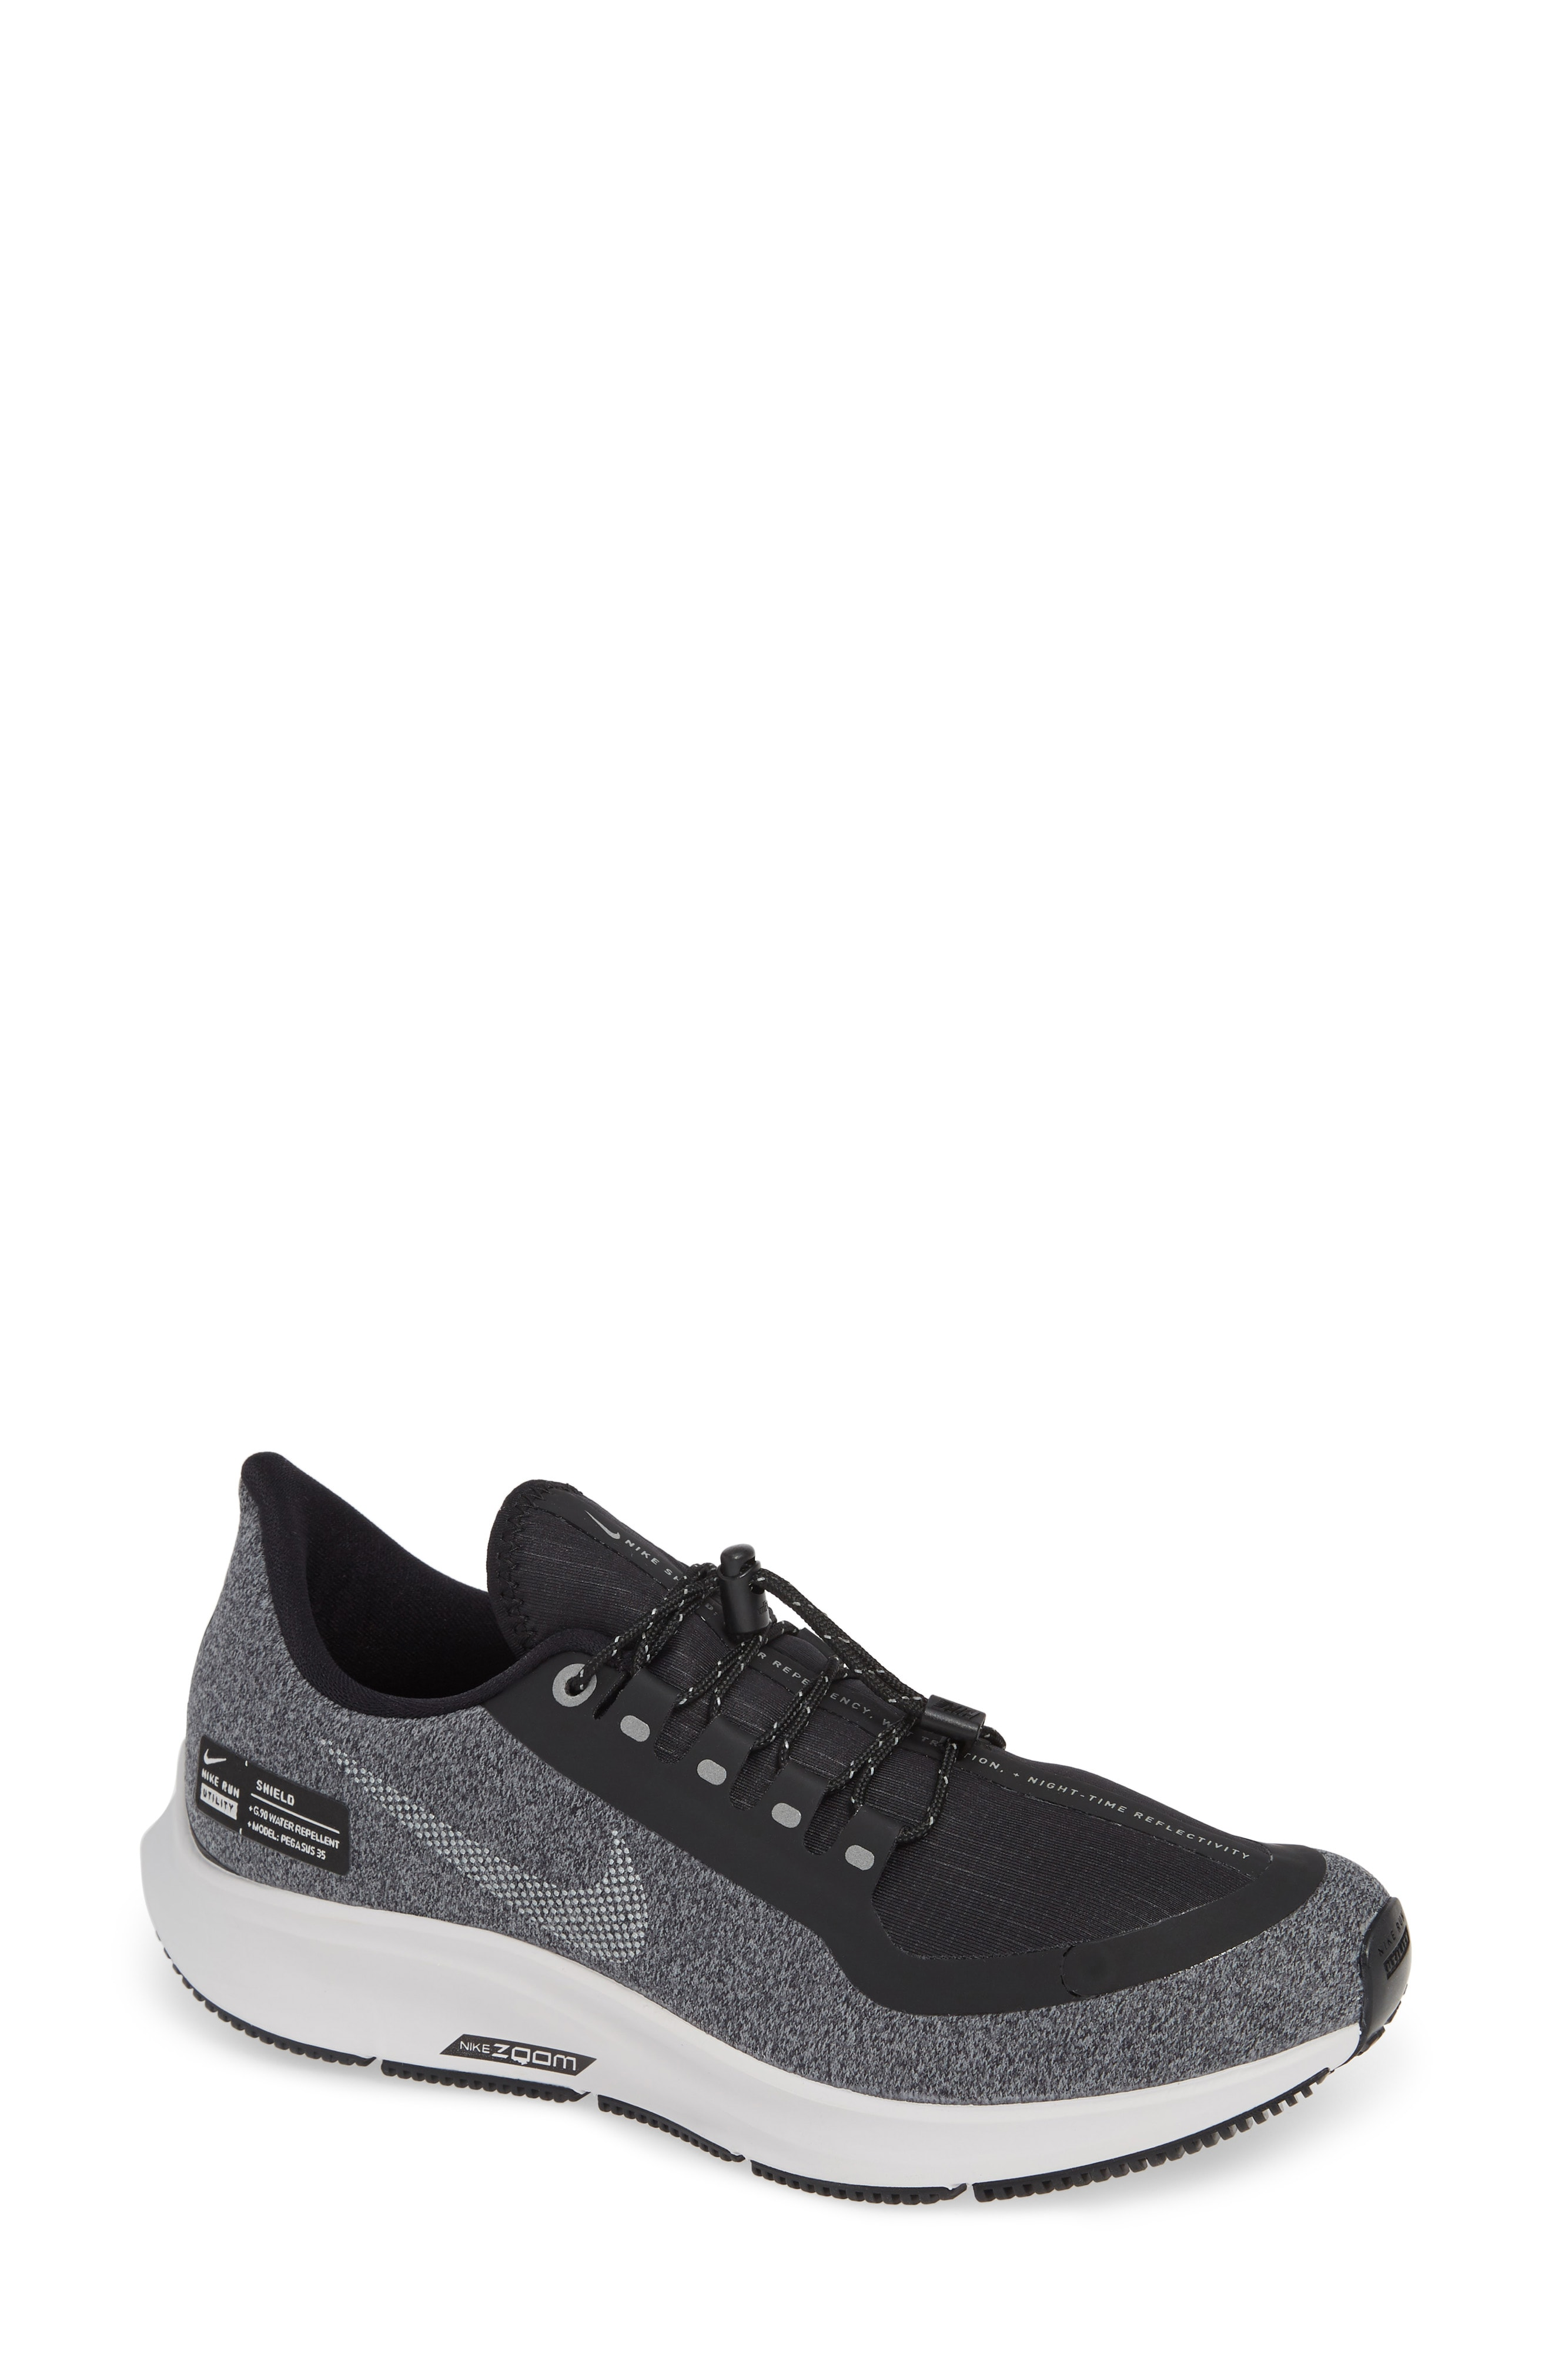 Nike Air Zoom Pegasus 35 Shield GS Water Repellent Running Shoe (Women)